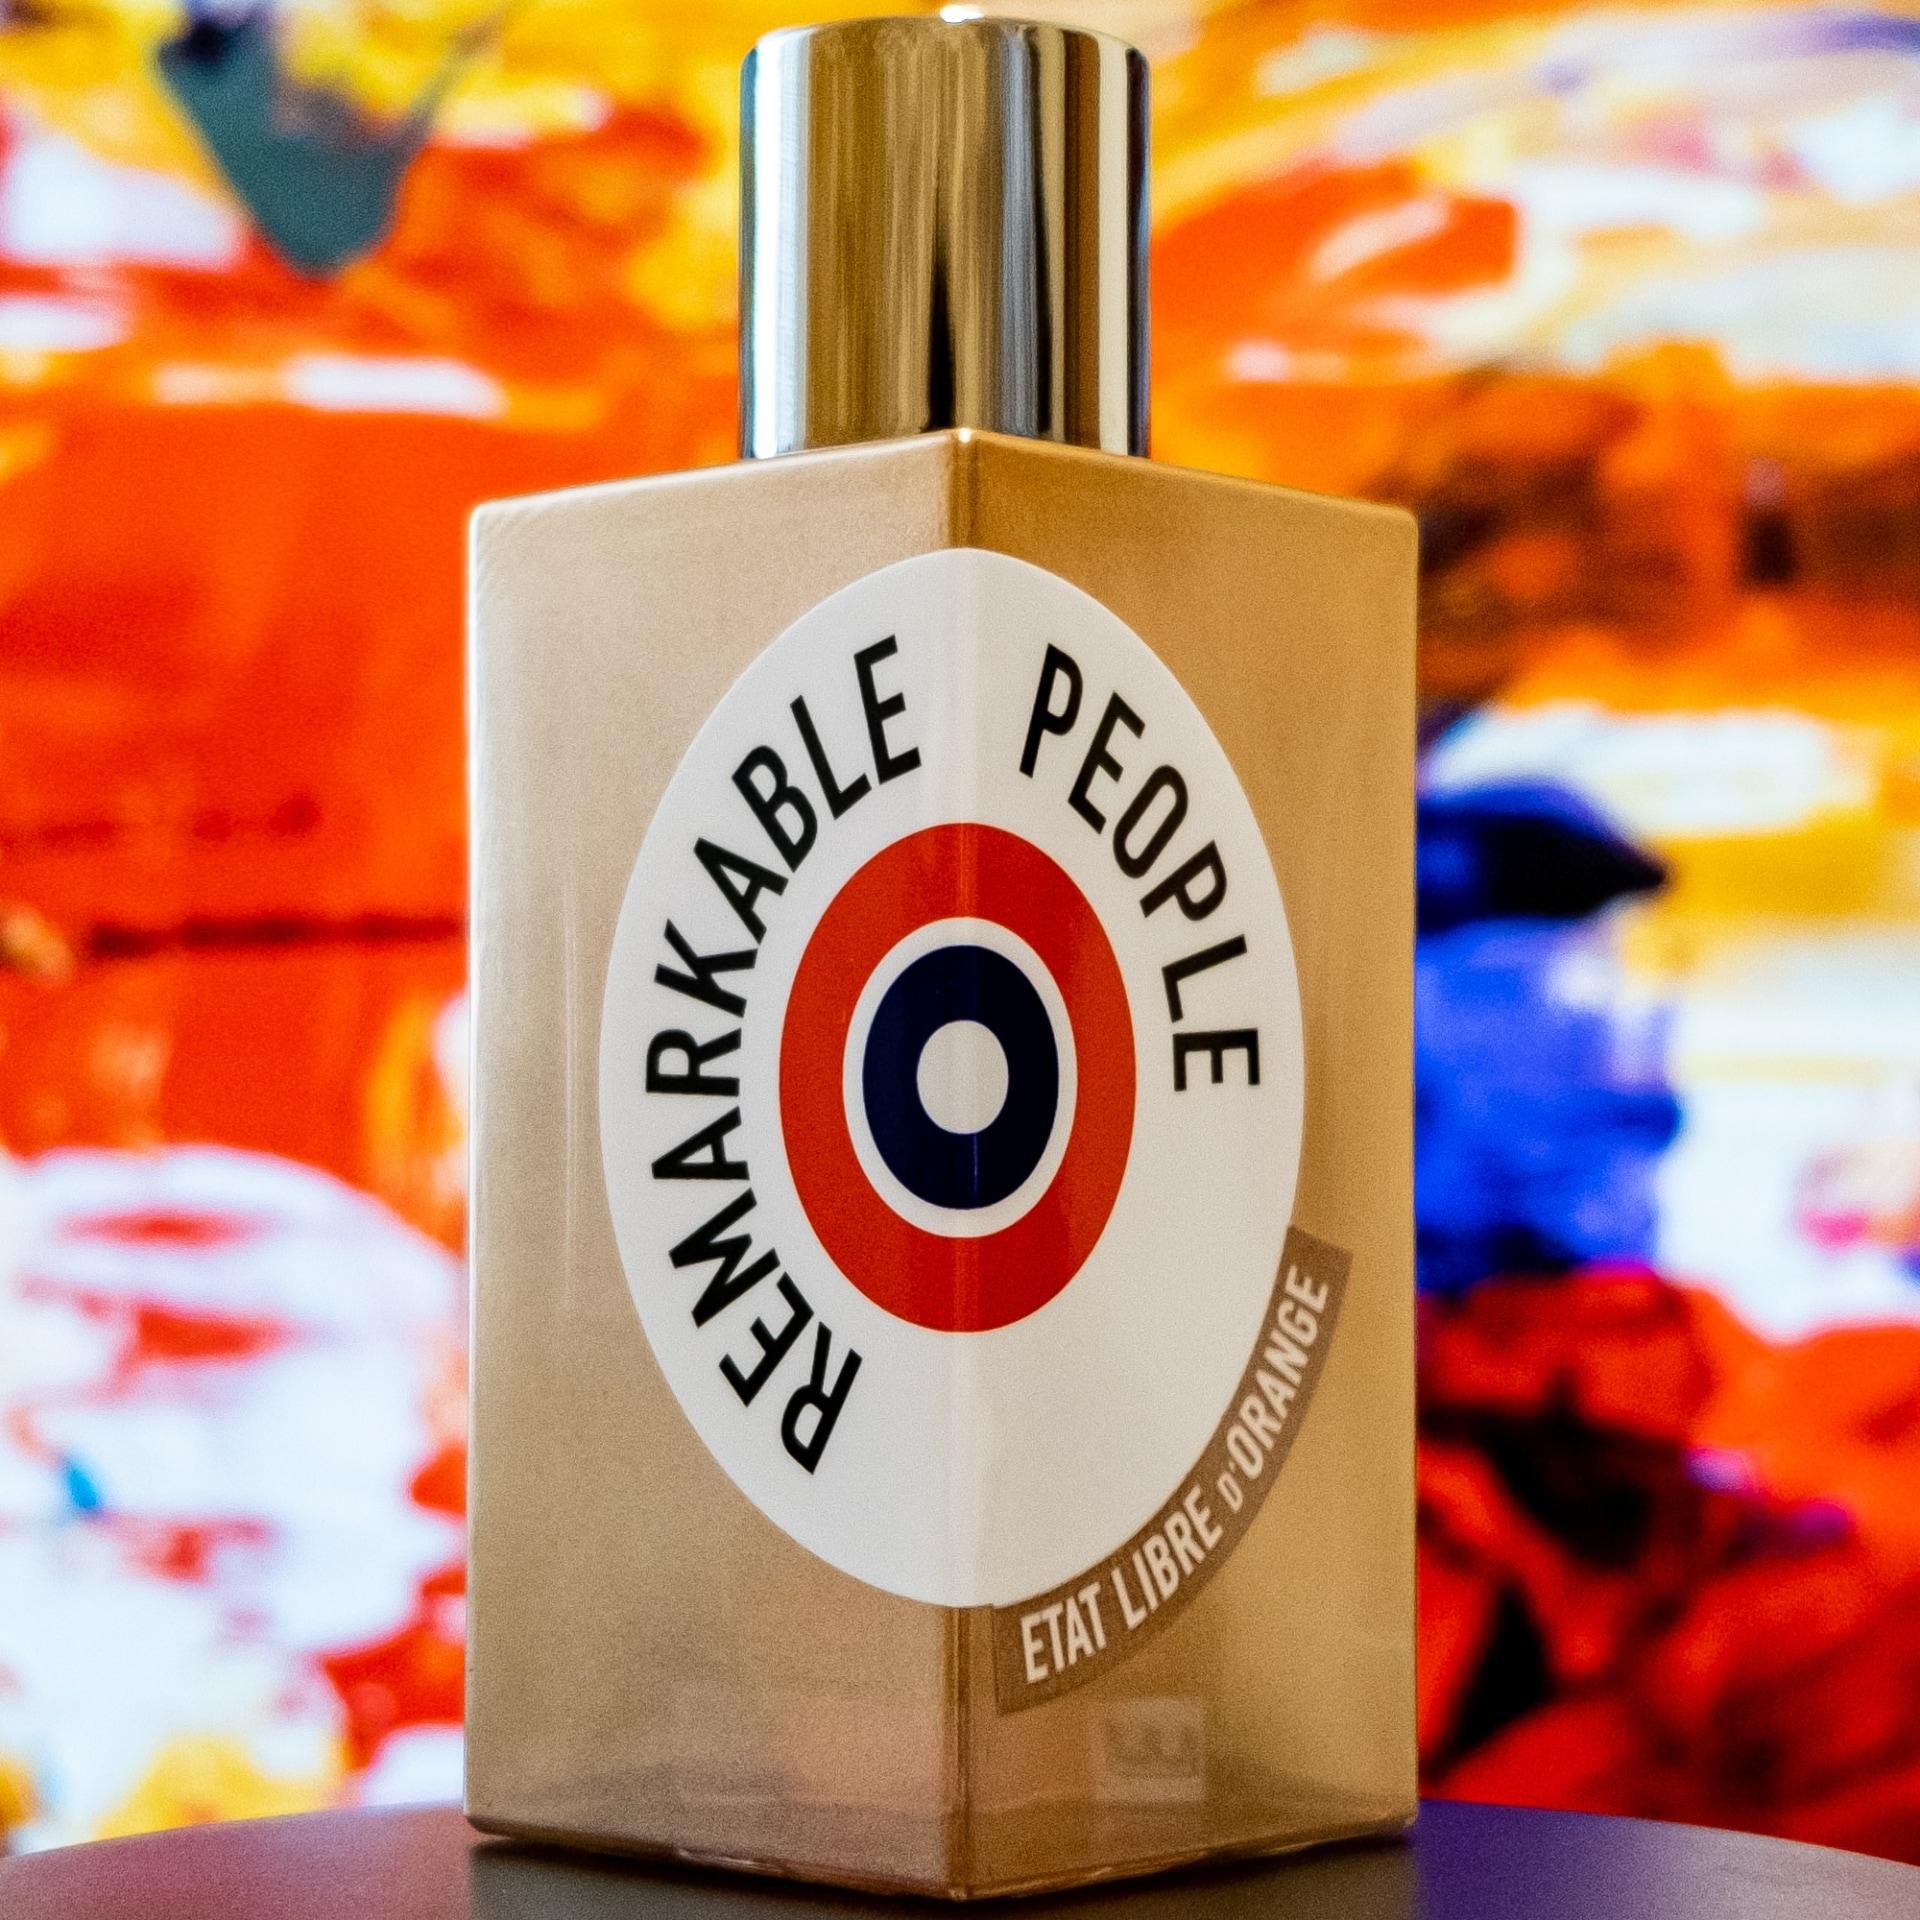 etat-libre-dorange-remarkable-people